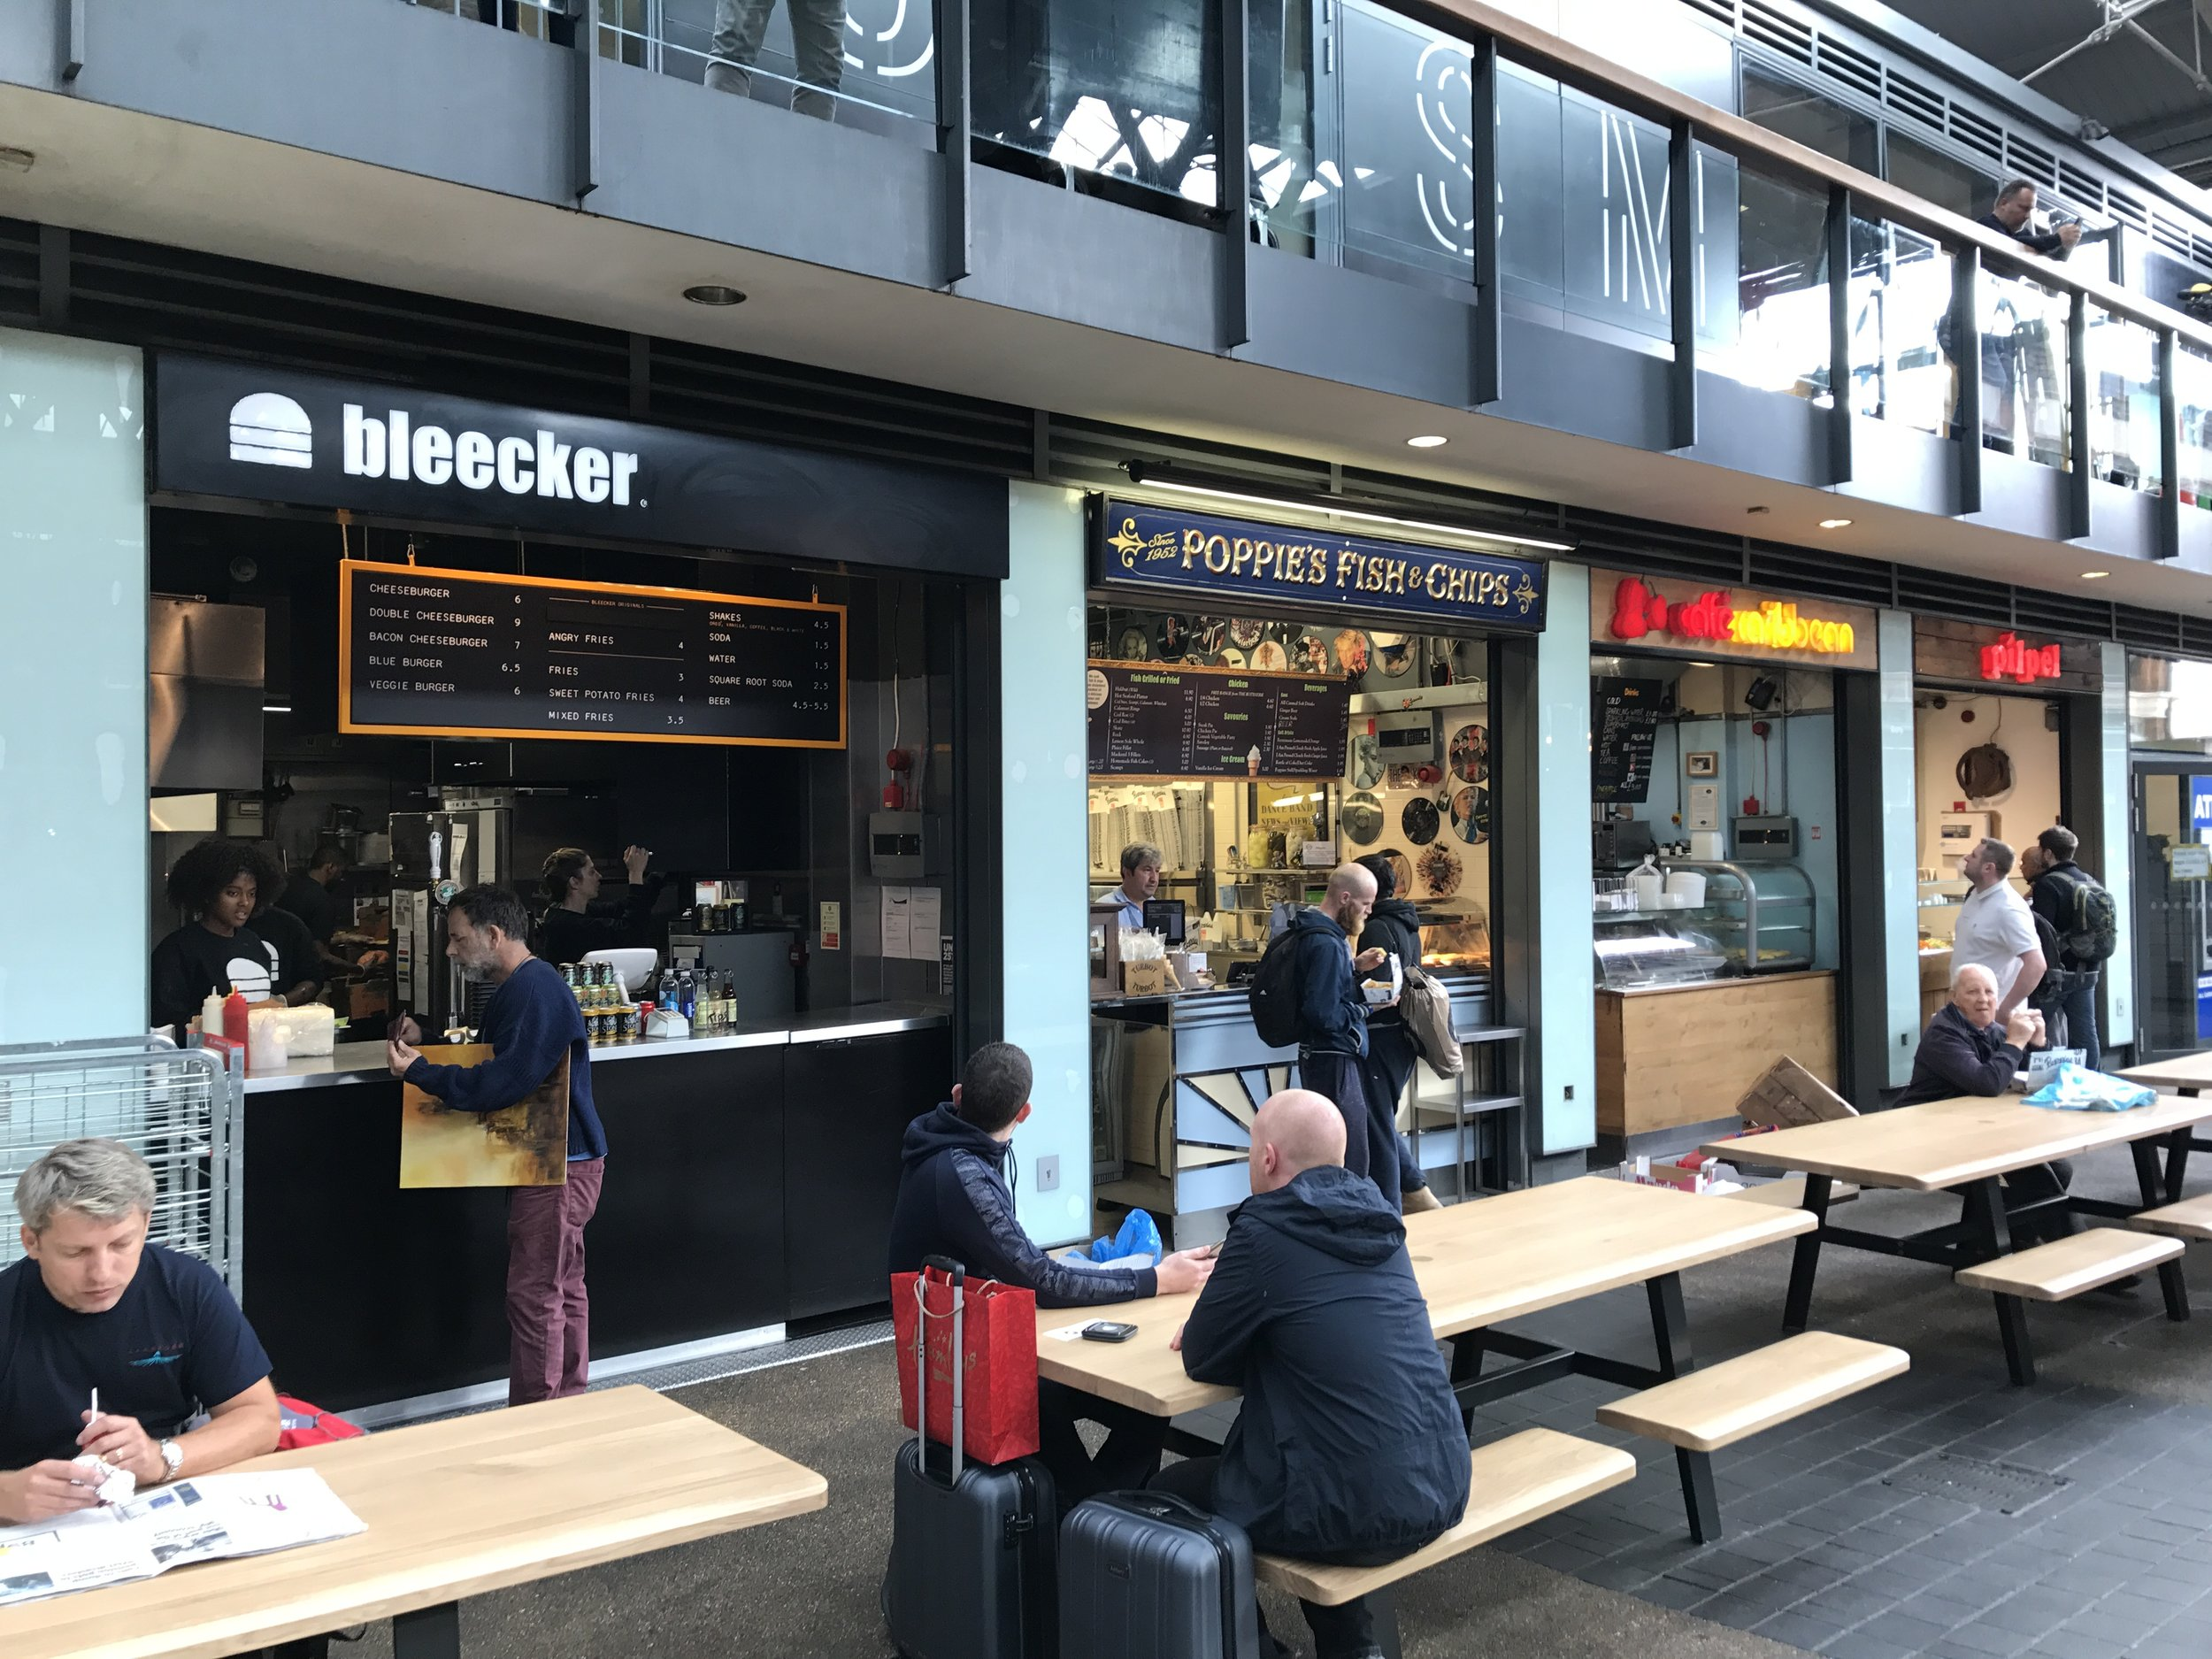 East London – Old Spitalfields Market restaraunts